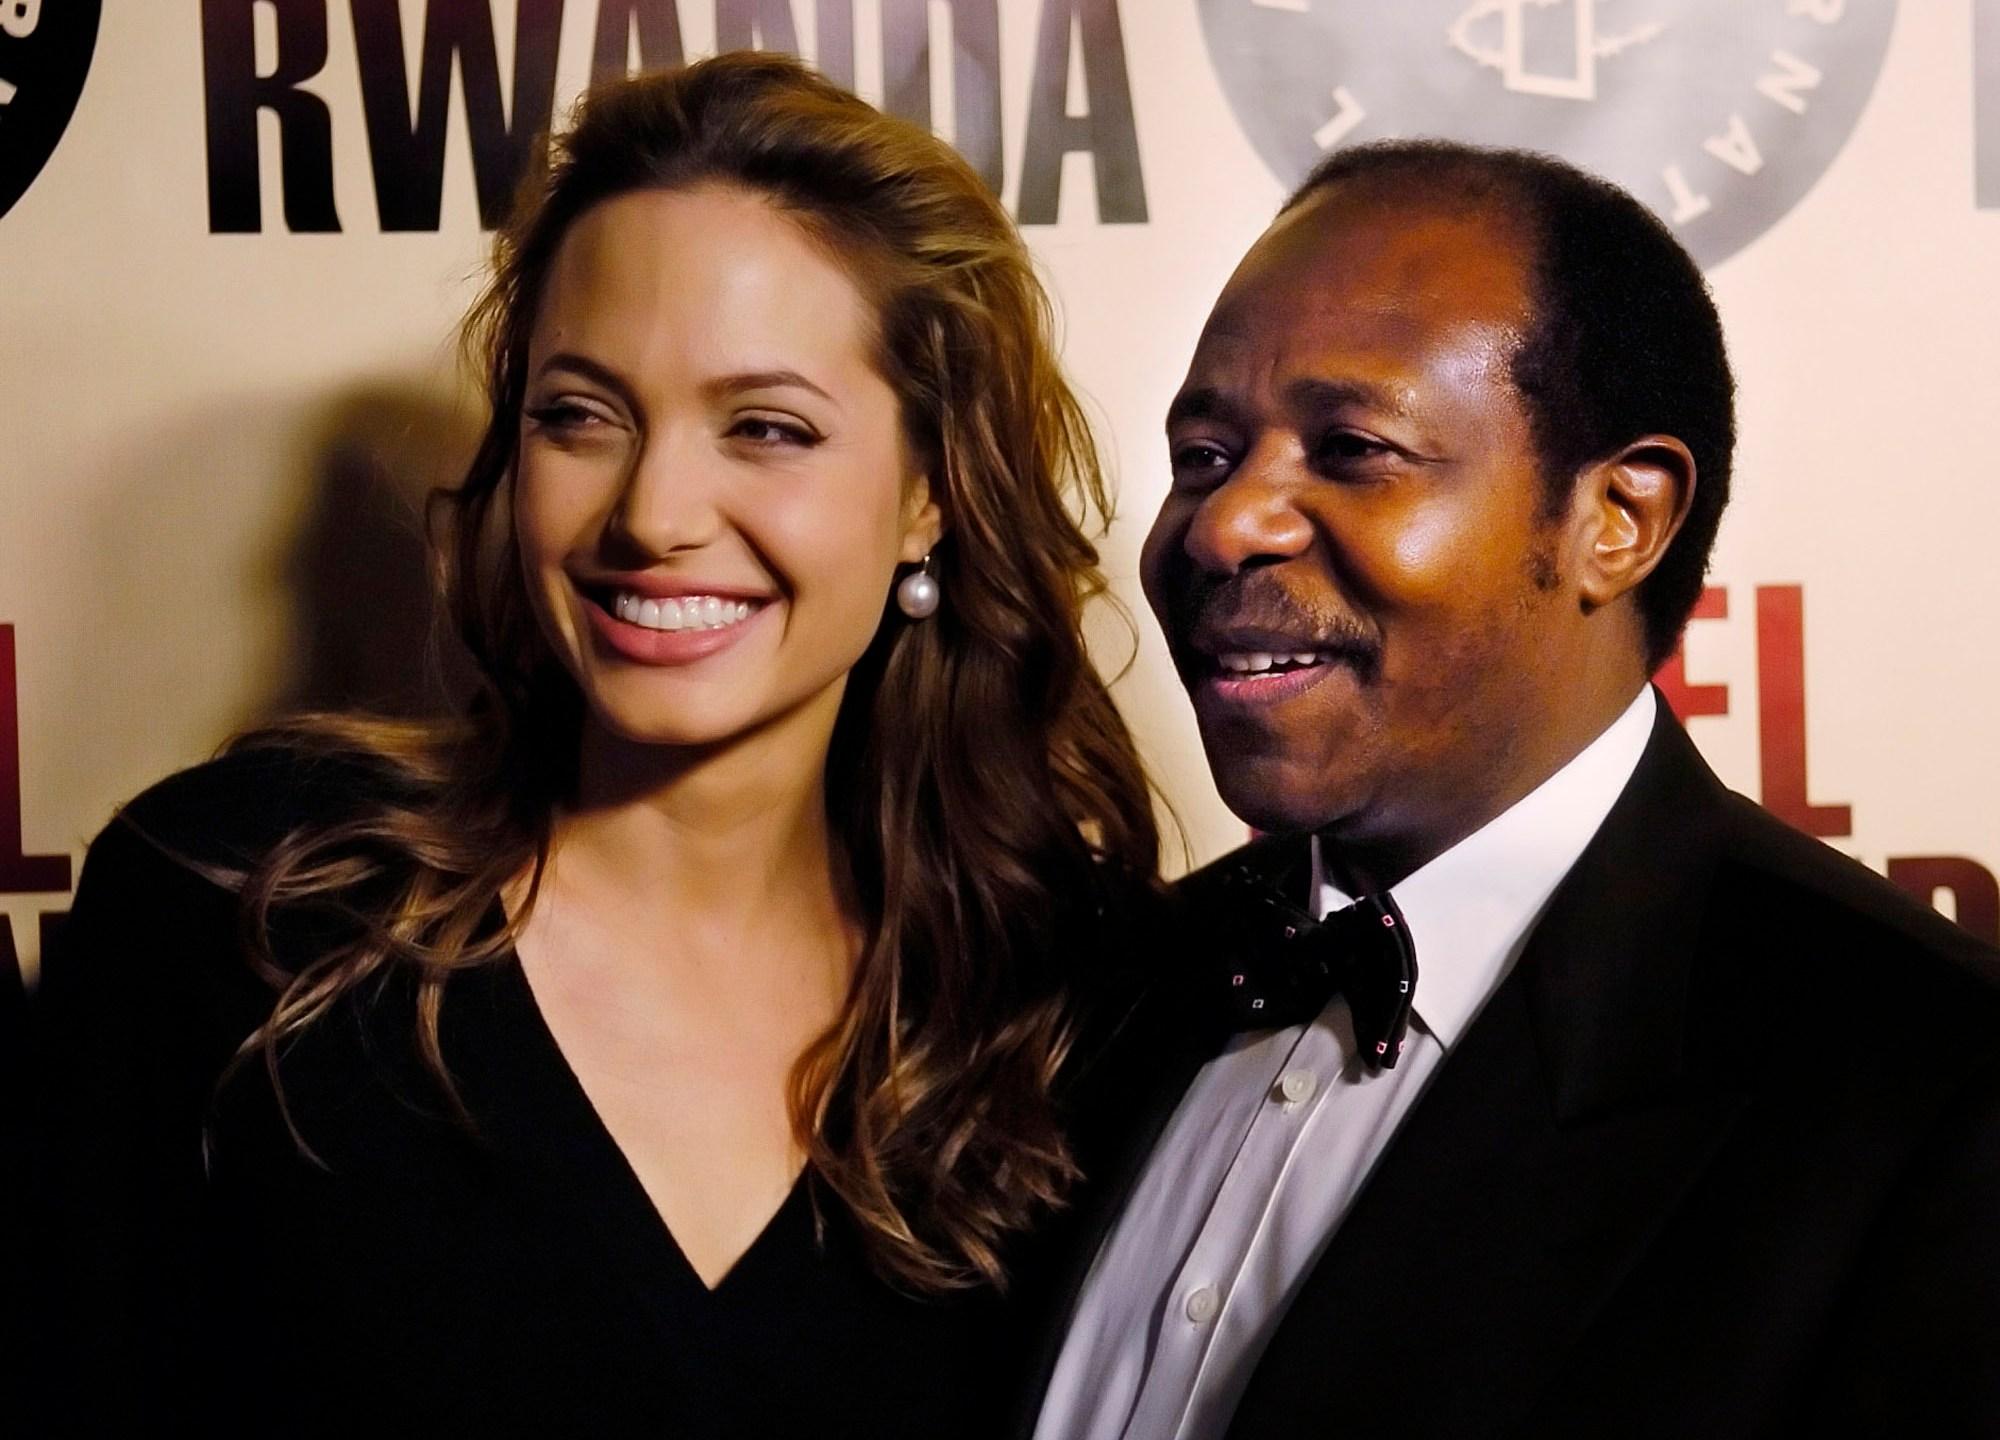 Paul Rusesabagina, Angelina Jolie, JOLIE RUSESABAGINA